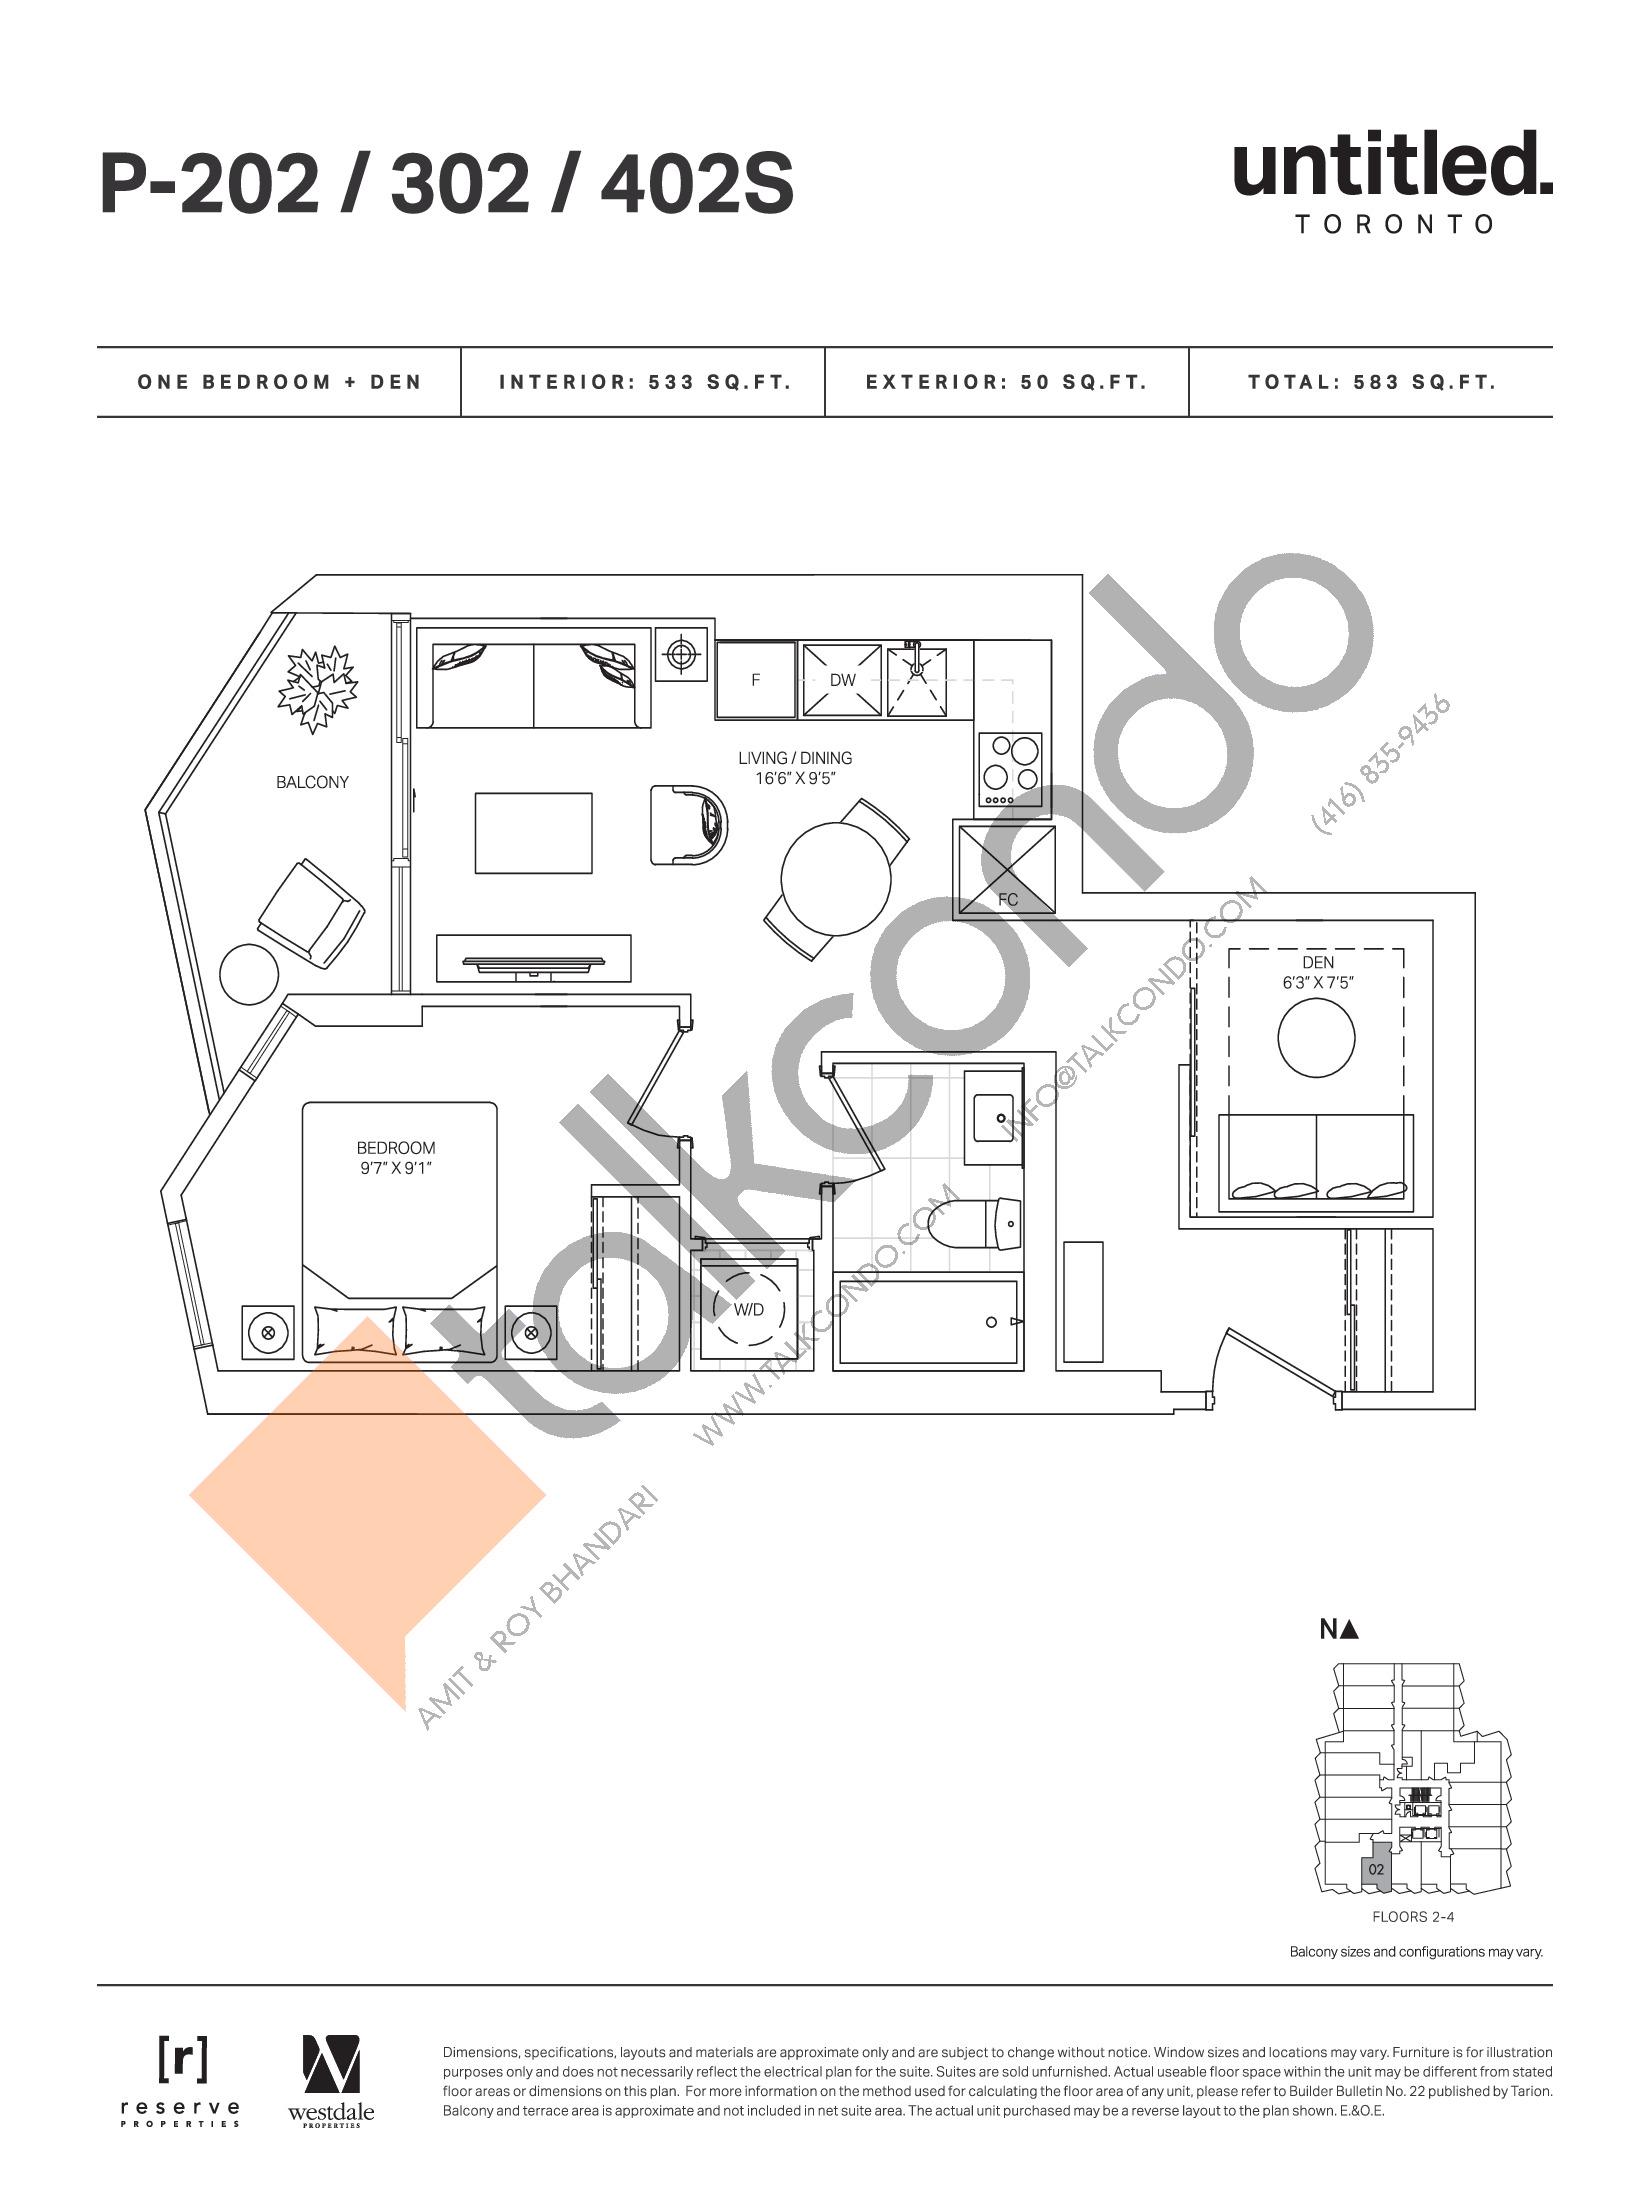 P-202 / 302 / 402S Floor Plan at Untitled Toronto Condos - 533 sq.ft